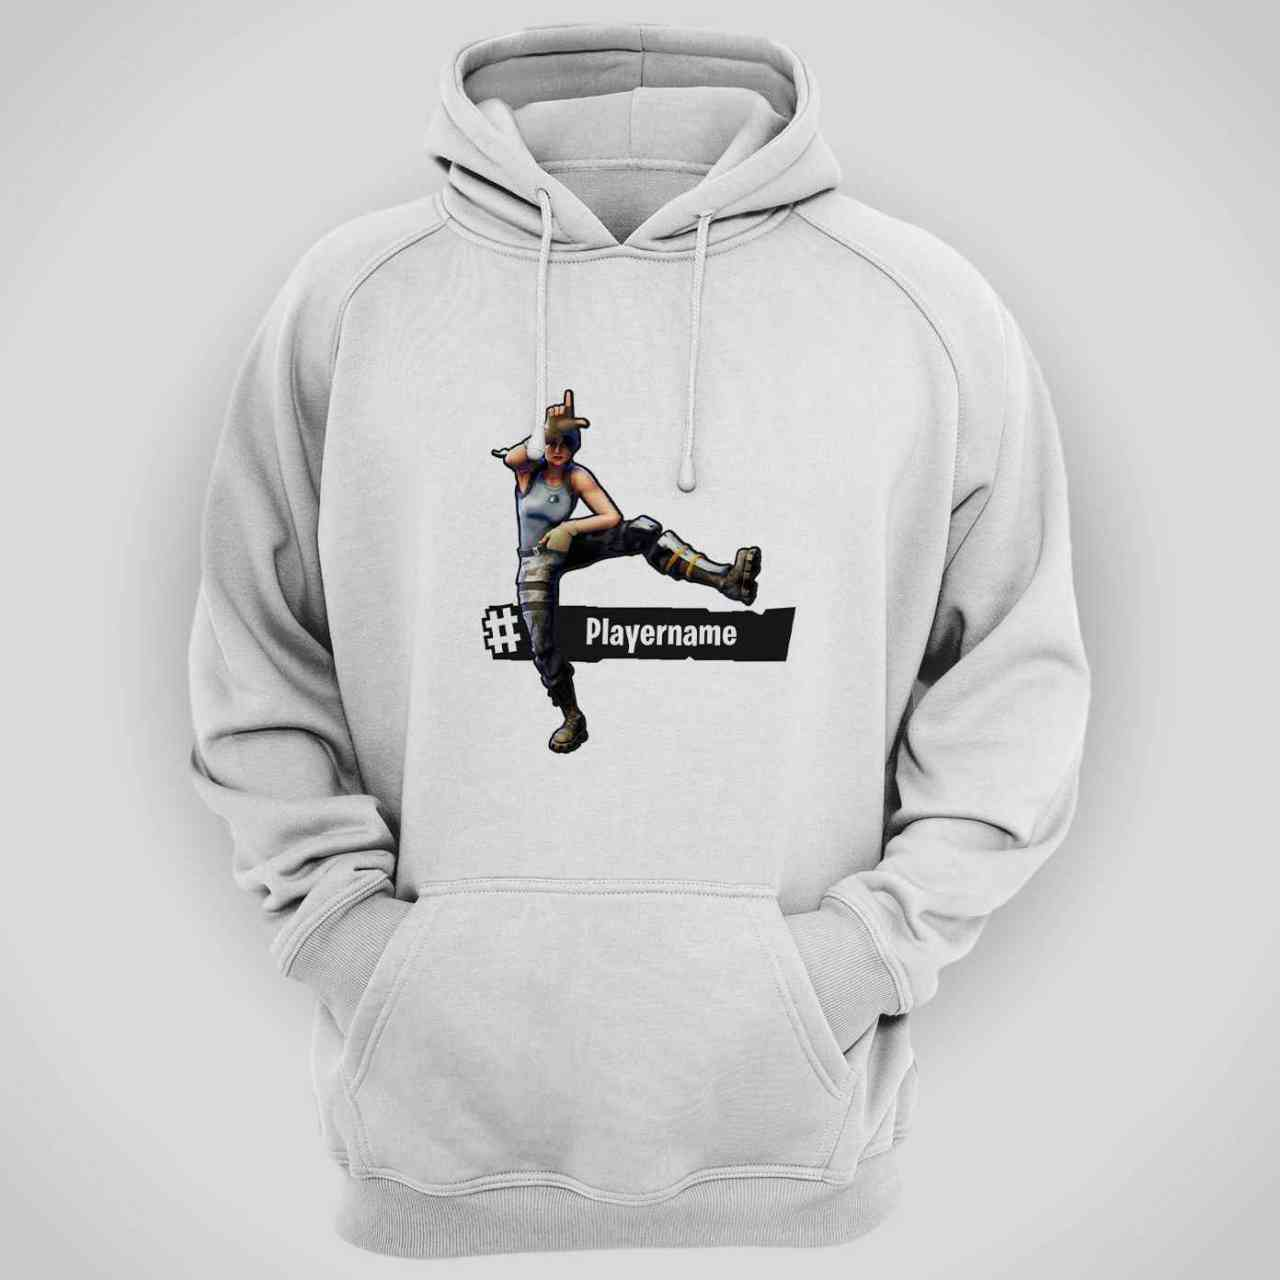 Fortnite Take The L Hoodie | mit Player-Name | Battle Royal | T-Shirt | Looser Fortnite